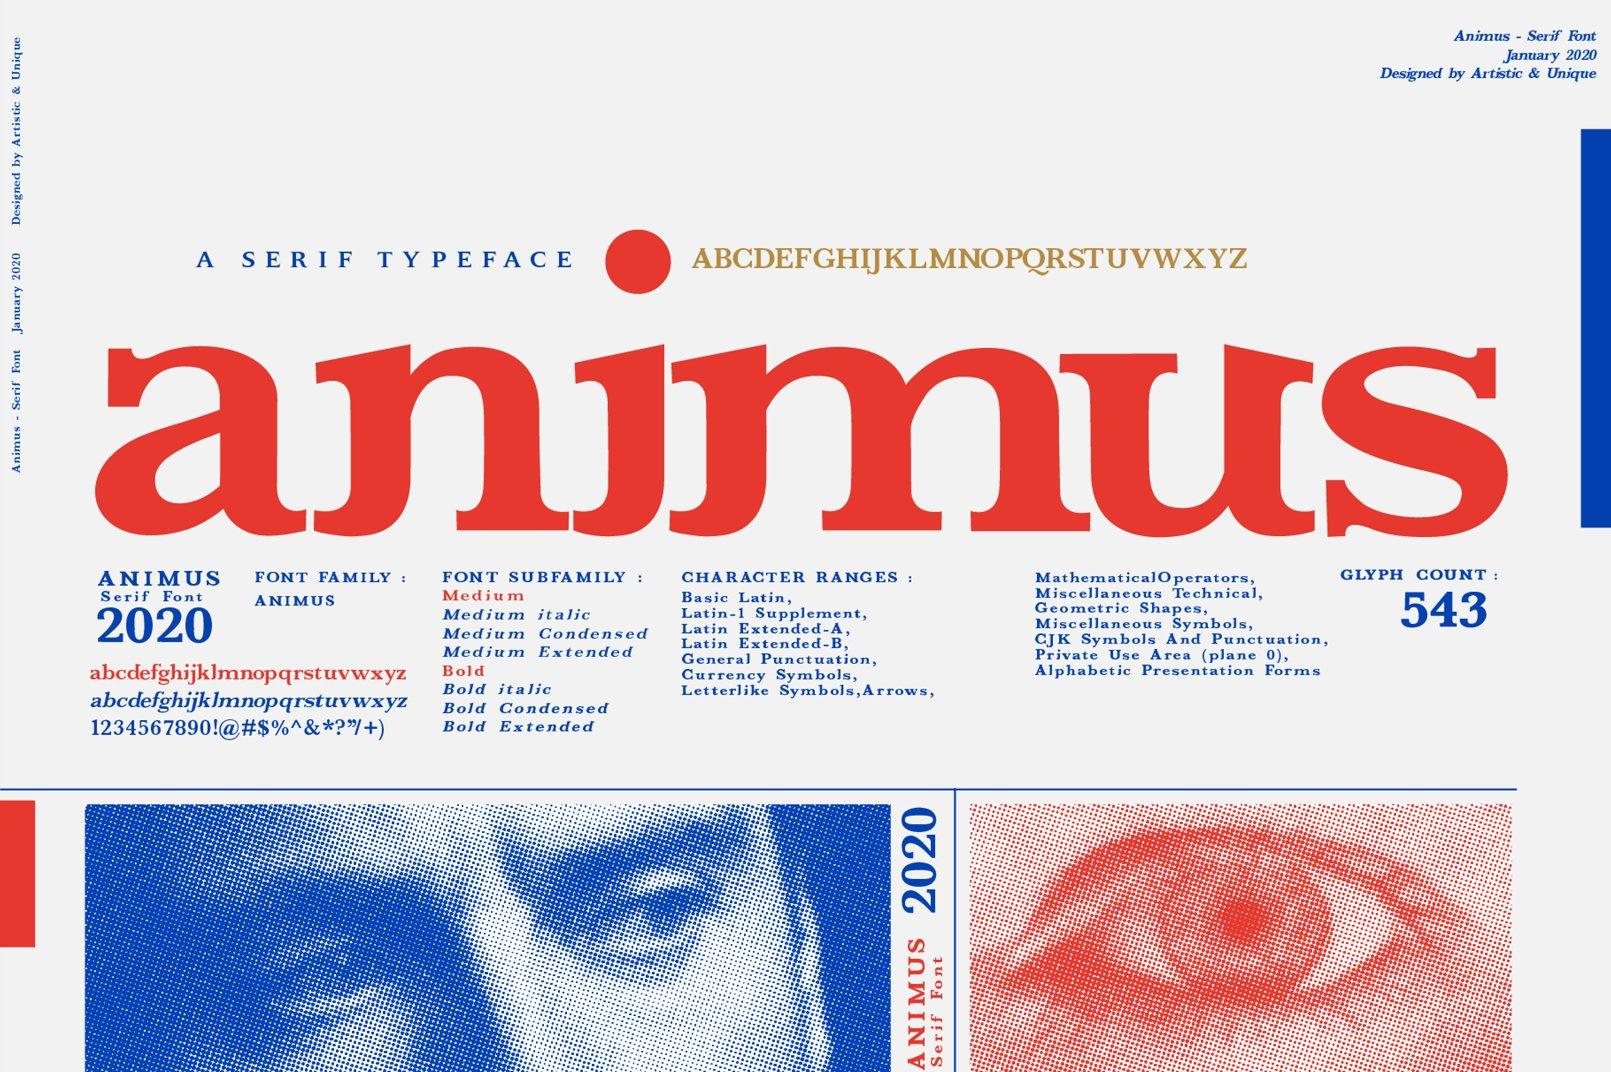 ANIMUS - Serif font family example image 1